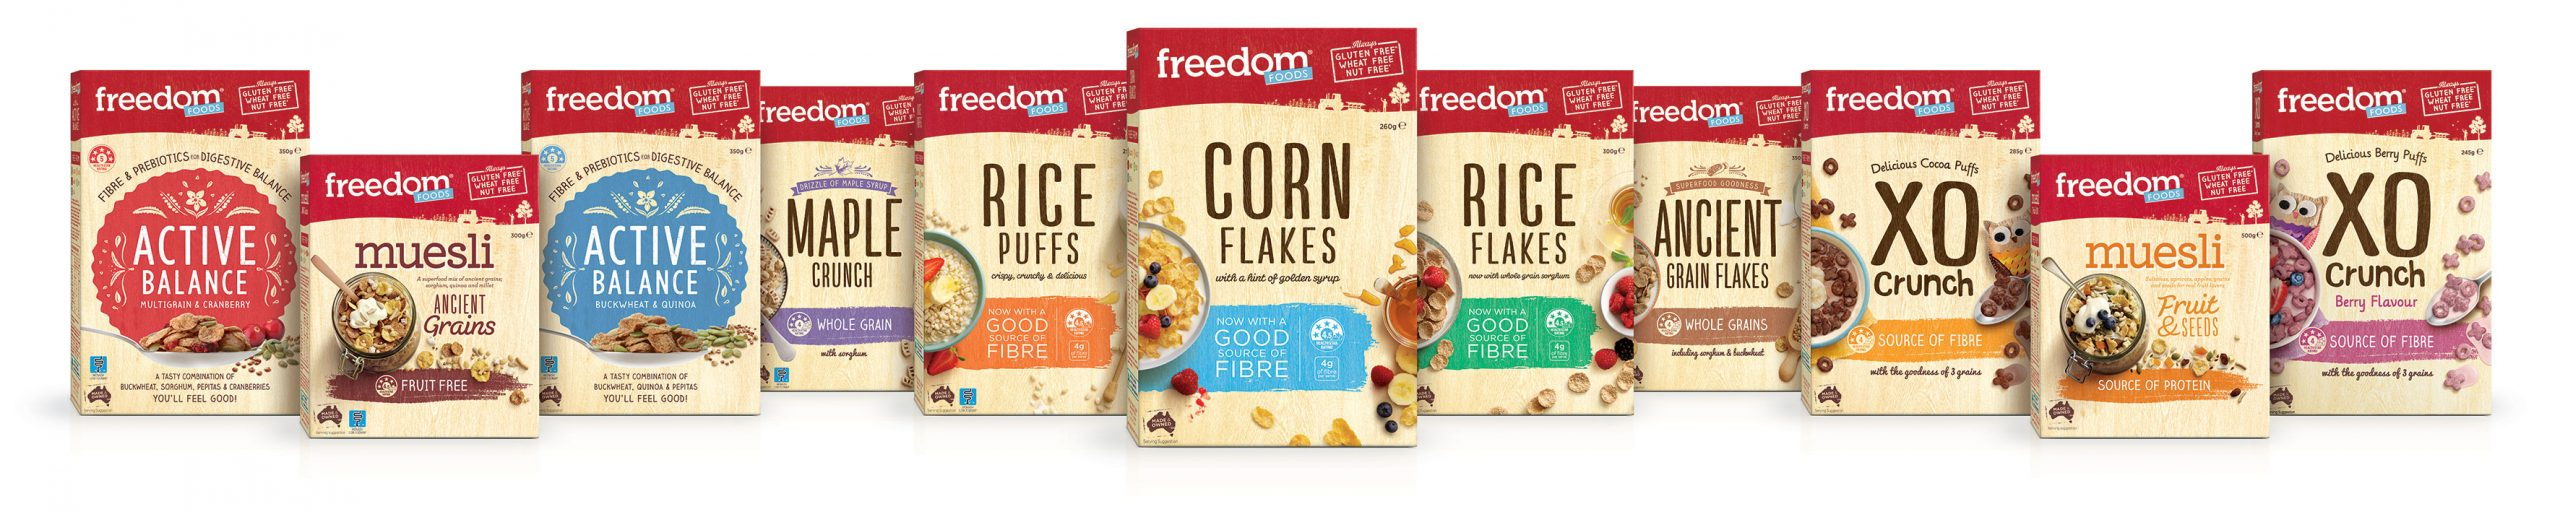 Freedom-Hero-2020-Cereal-RED-RANGE-FULL-SMALL